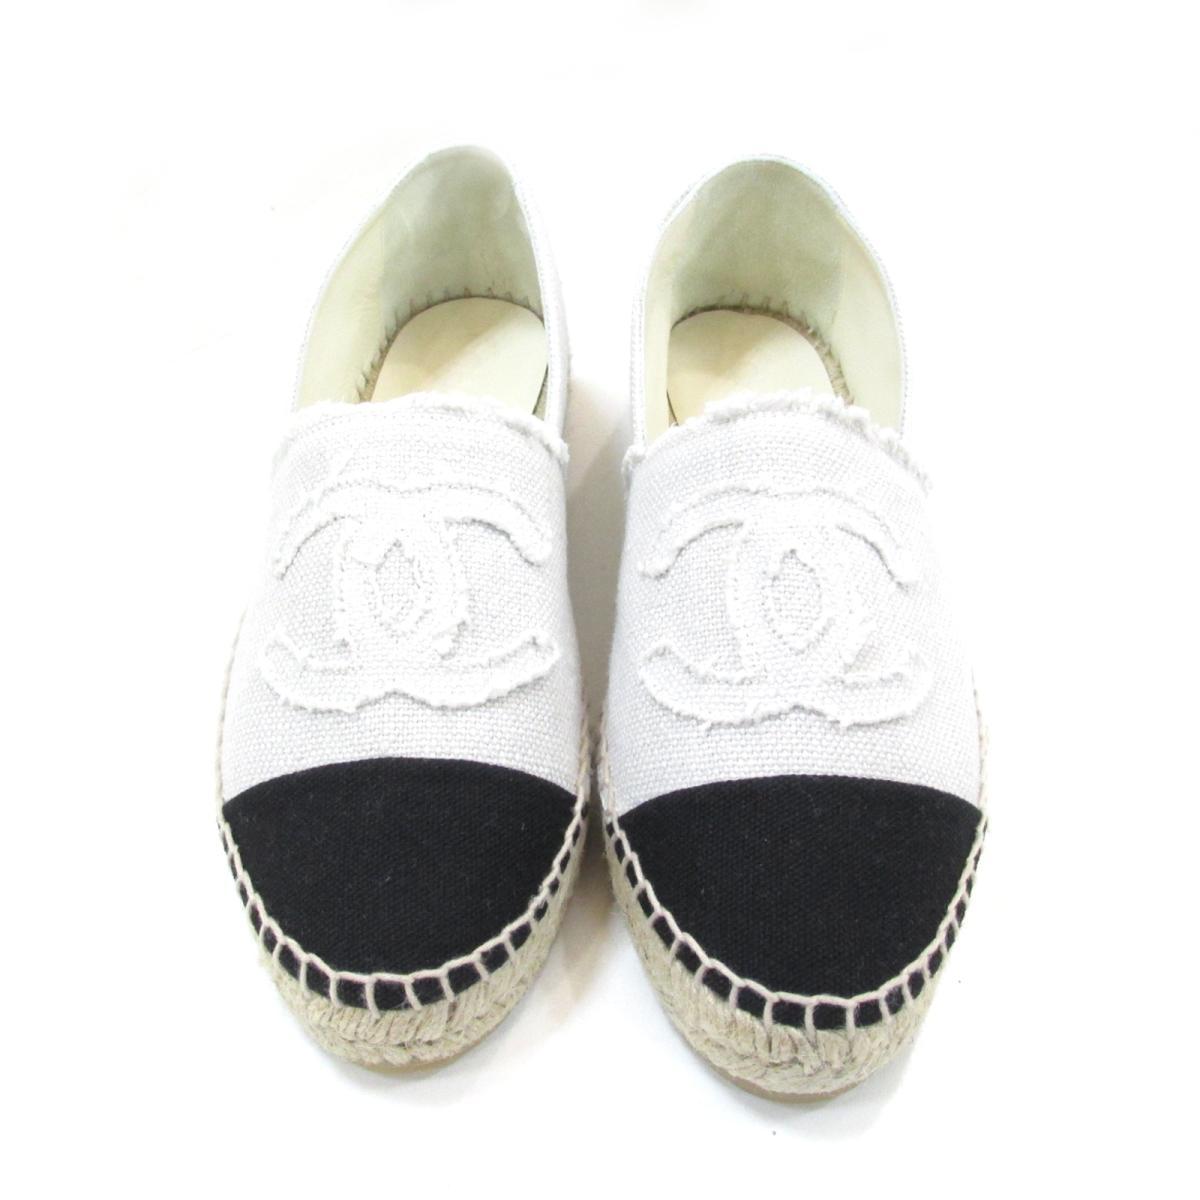 Prix usine 2019 classique chic plus grand choix Chanel espadrille or other lady's canvas white X black | CHANEL BRANDOFF  brand off-brand shoes shoes shoes slip-ons